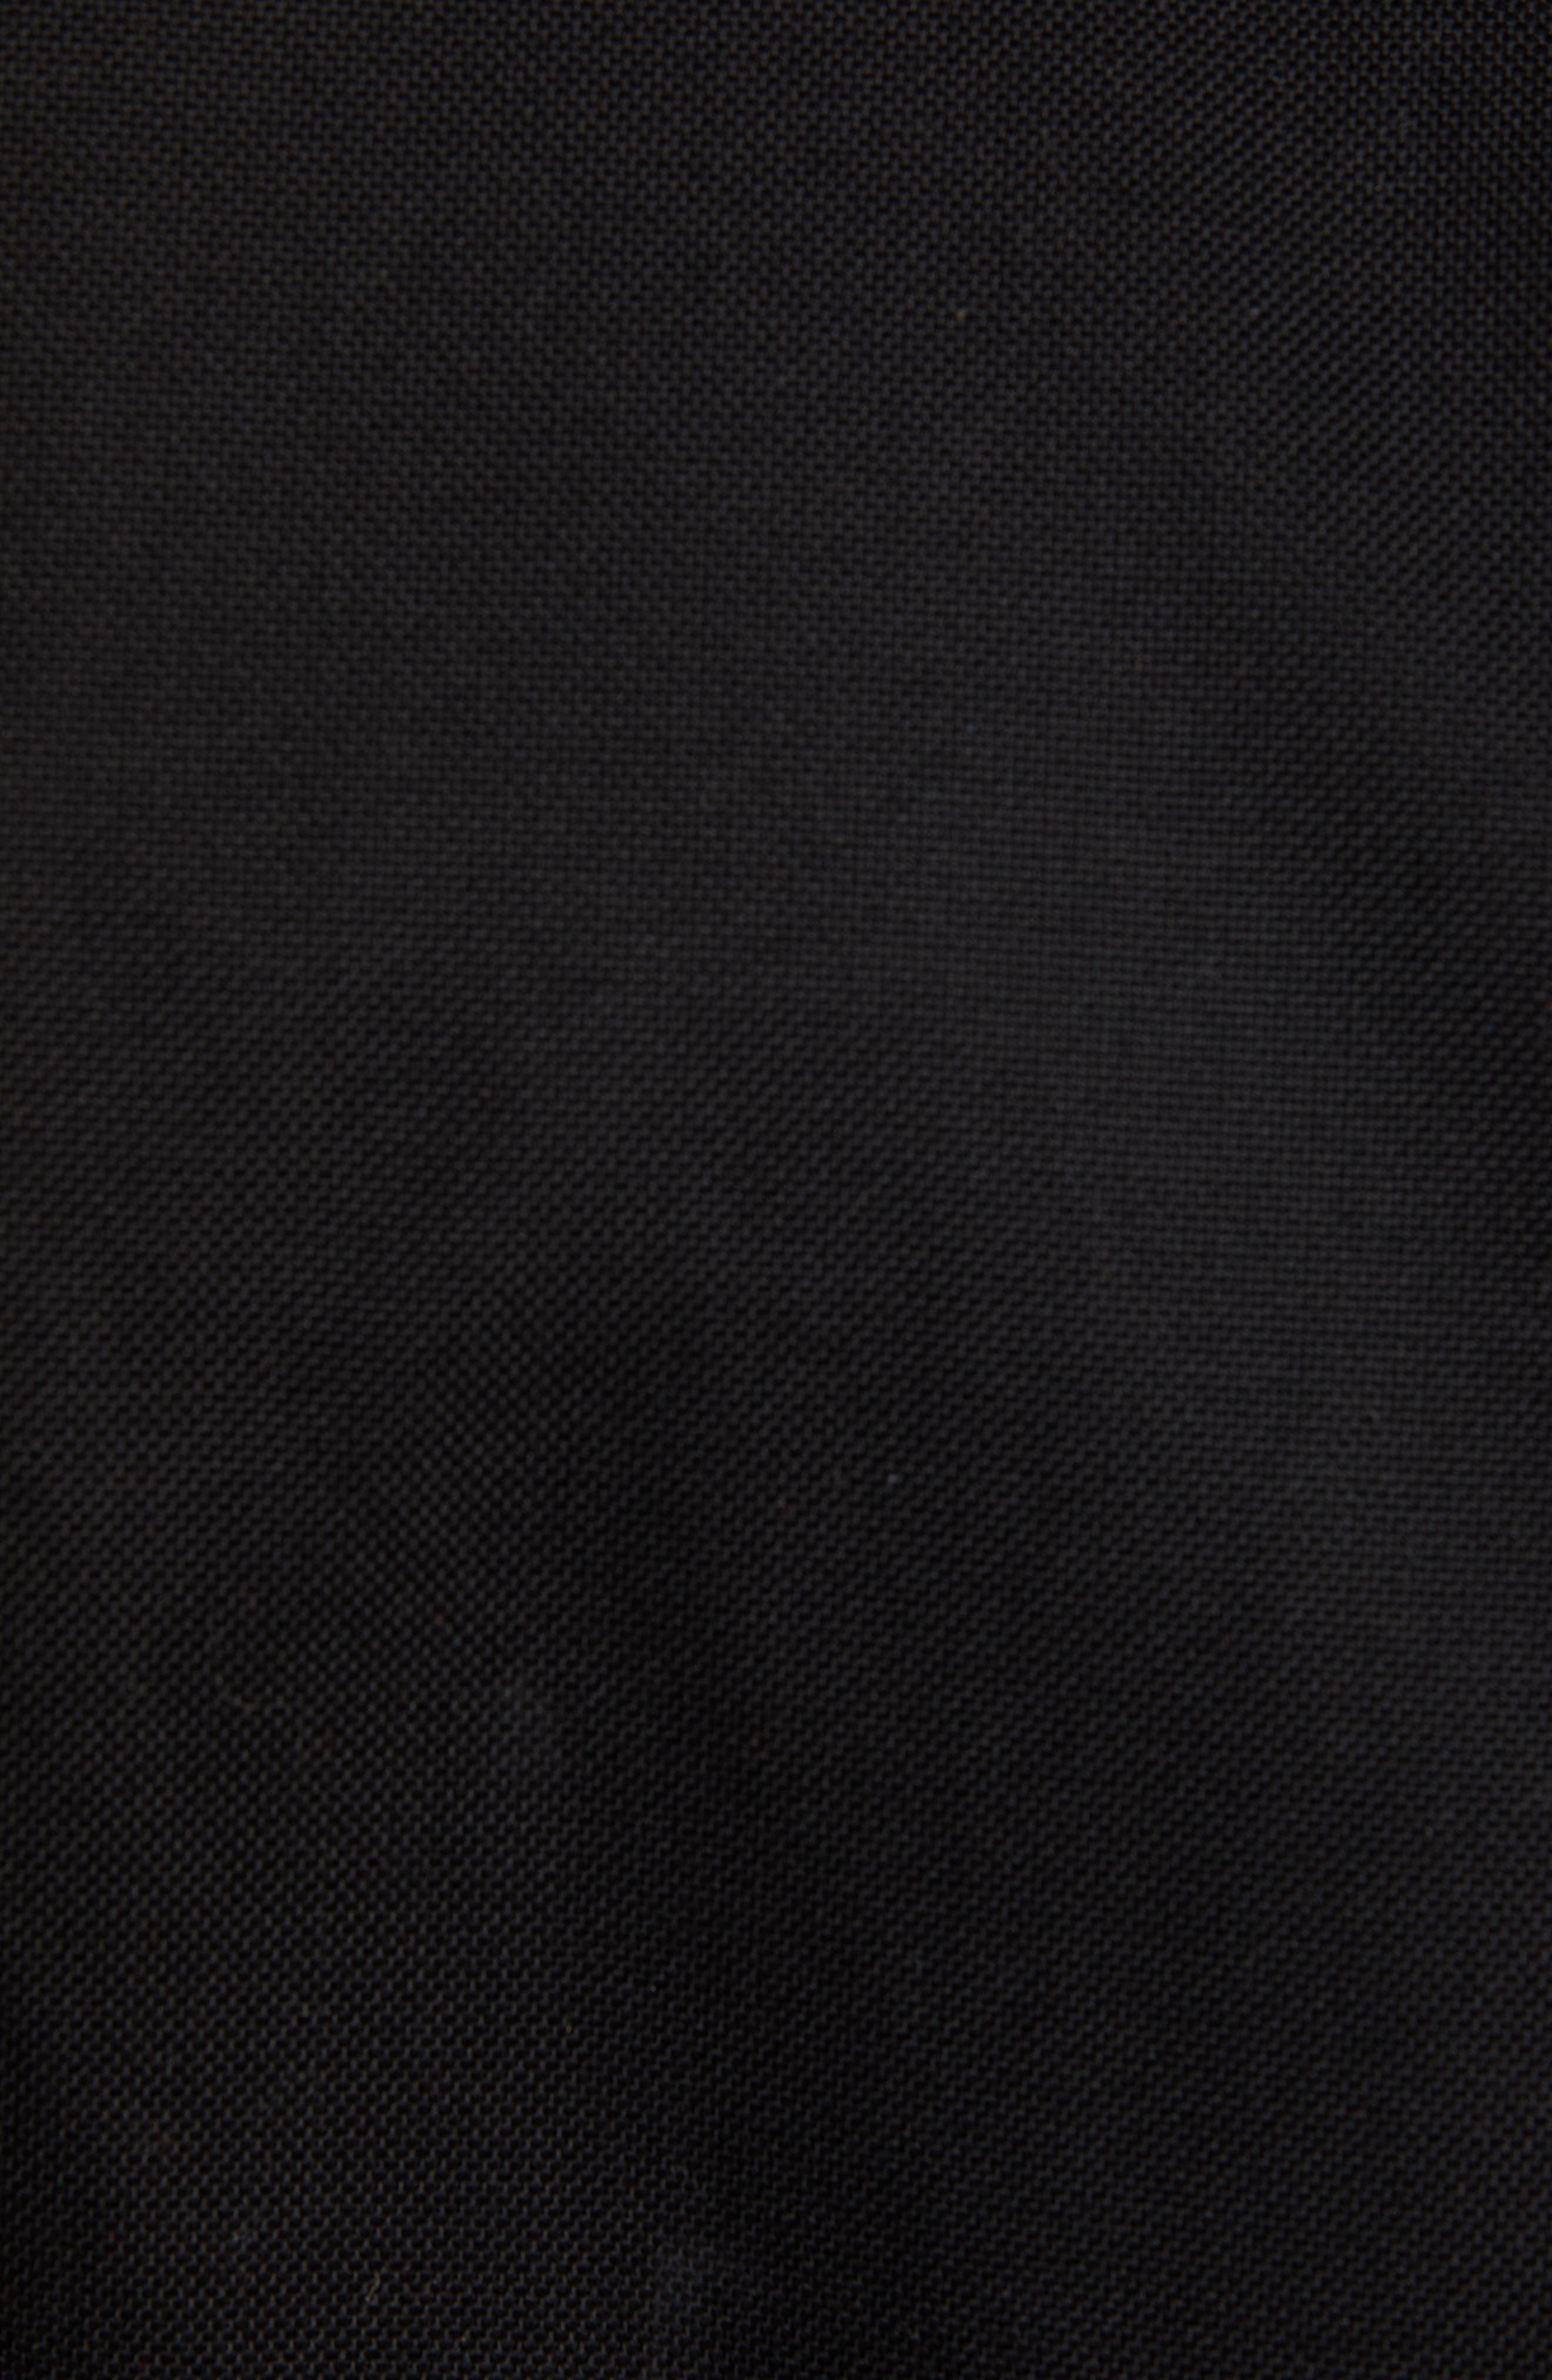 THE KOOPLES, Leather Detail Jacket, Alternate thumbnail 6, color, BLACK